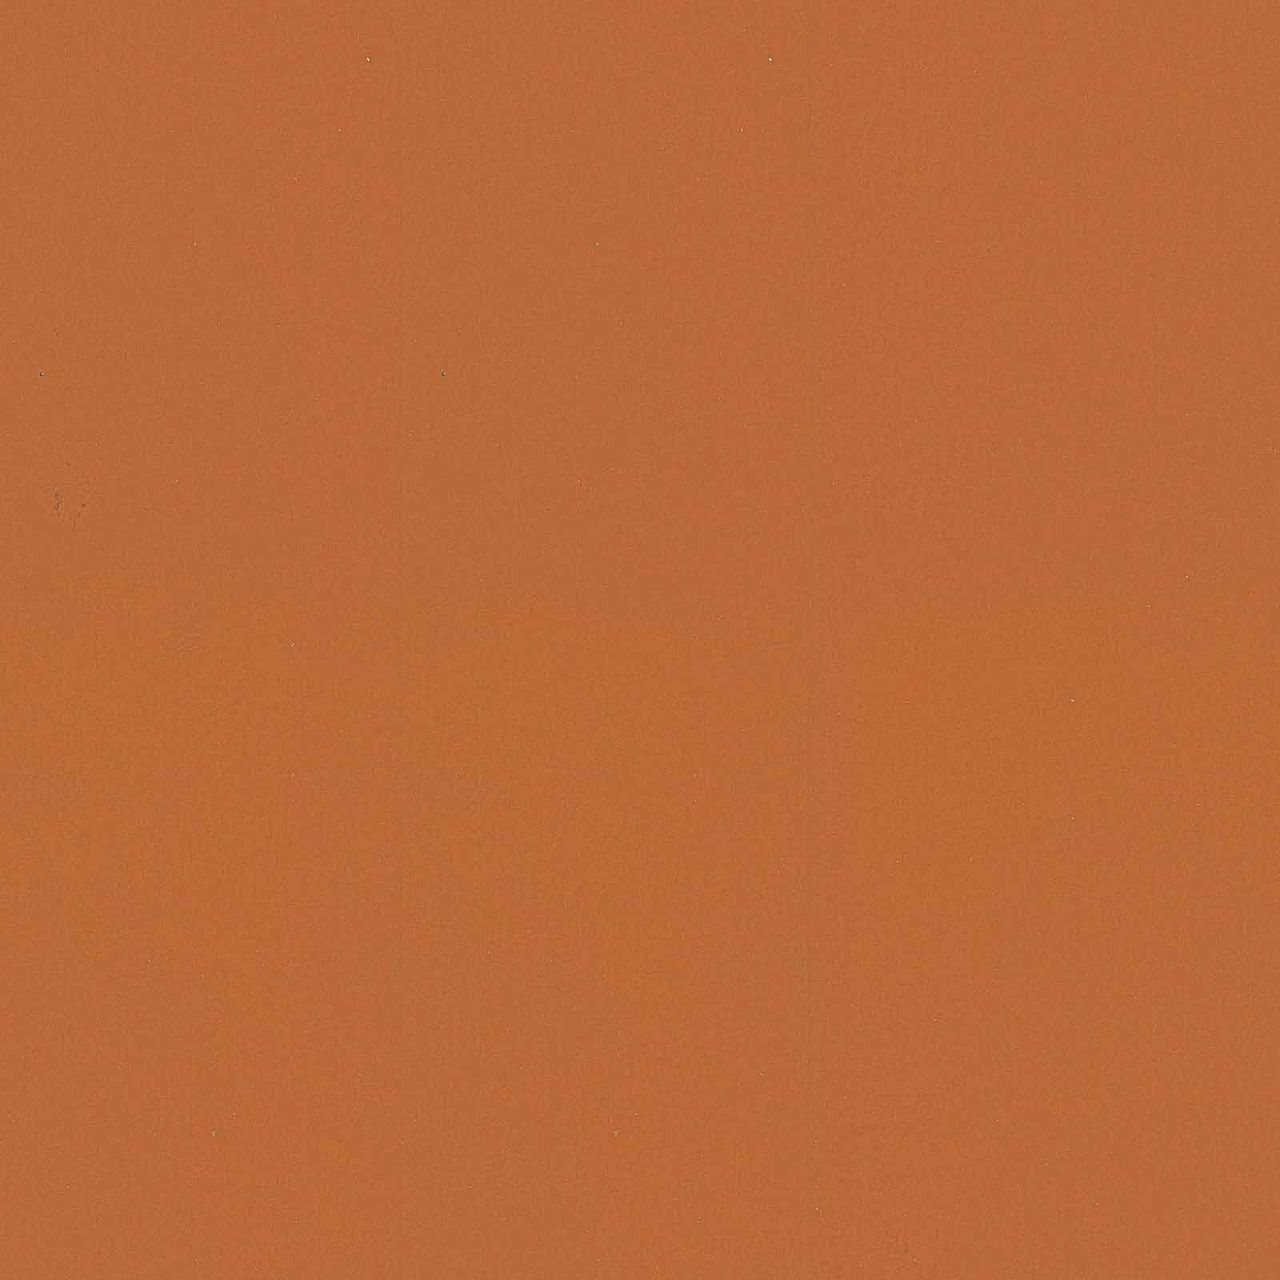 ALUCOBOND PLUS Siena Copper Mettalic 709